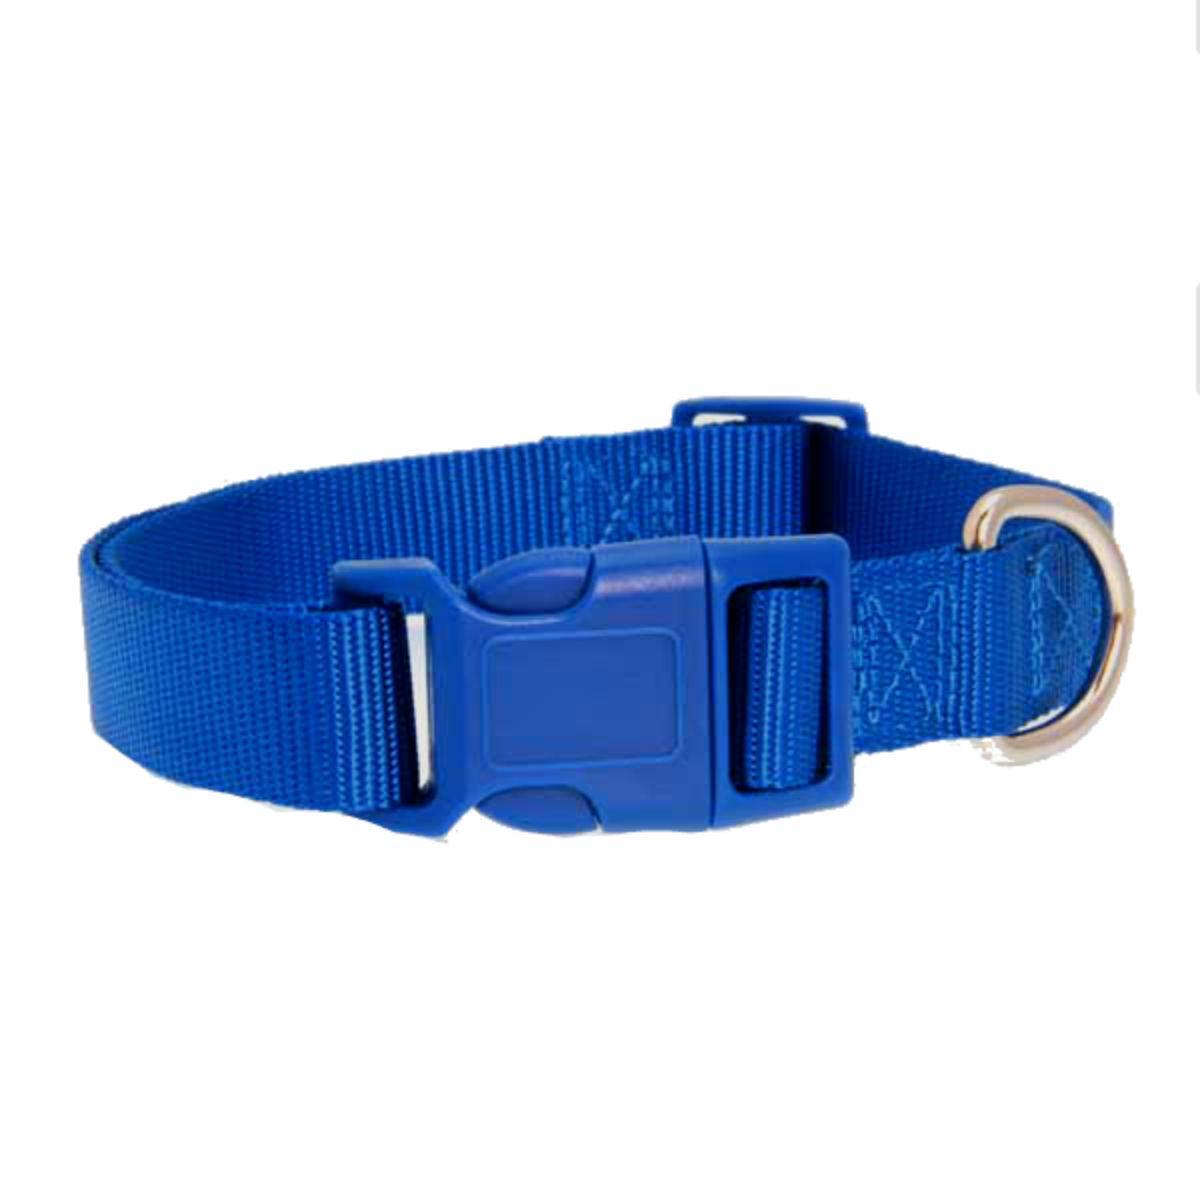 Casual Canine Nylon Dog Collar - Nautical Blue